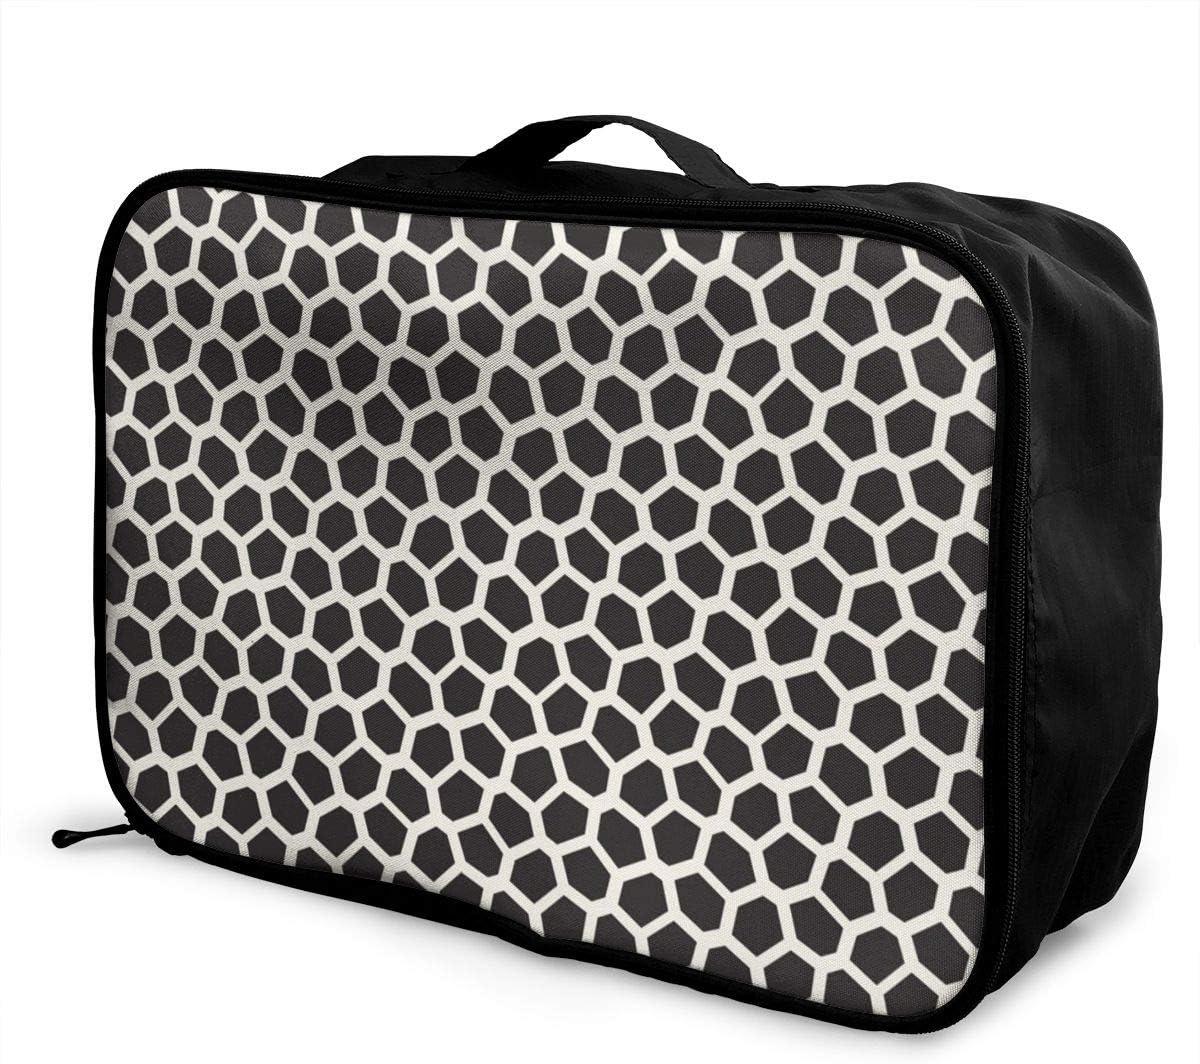 Yunshm Abstract Irregular Line Mosaic Pattern Customized Trolley Handbag Waterproof Unisex Large Capacity For Business Travel Storage